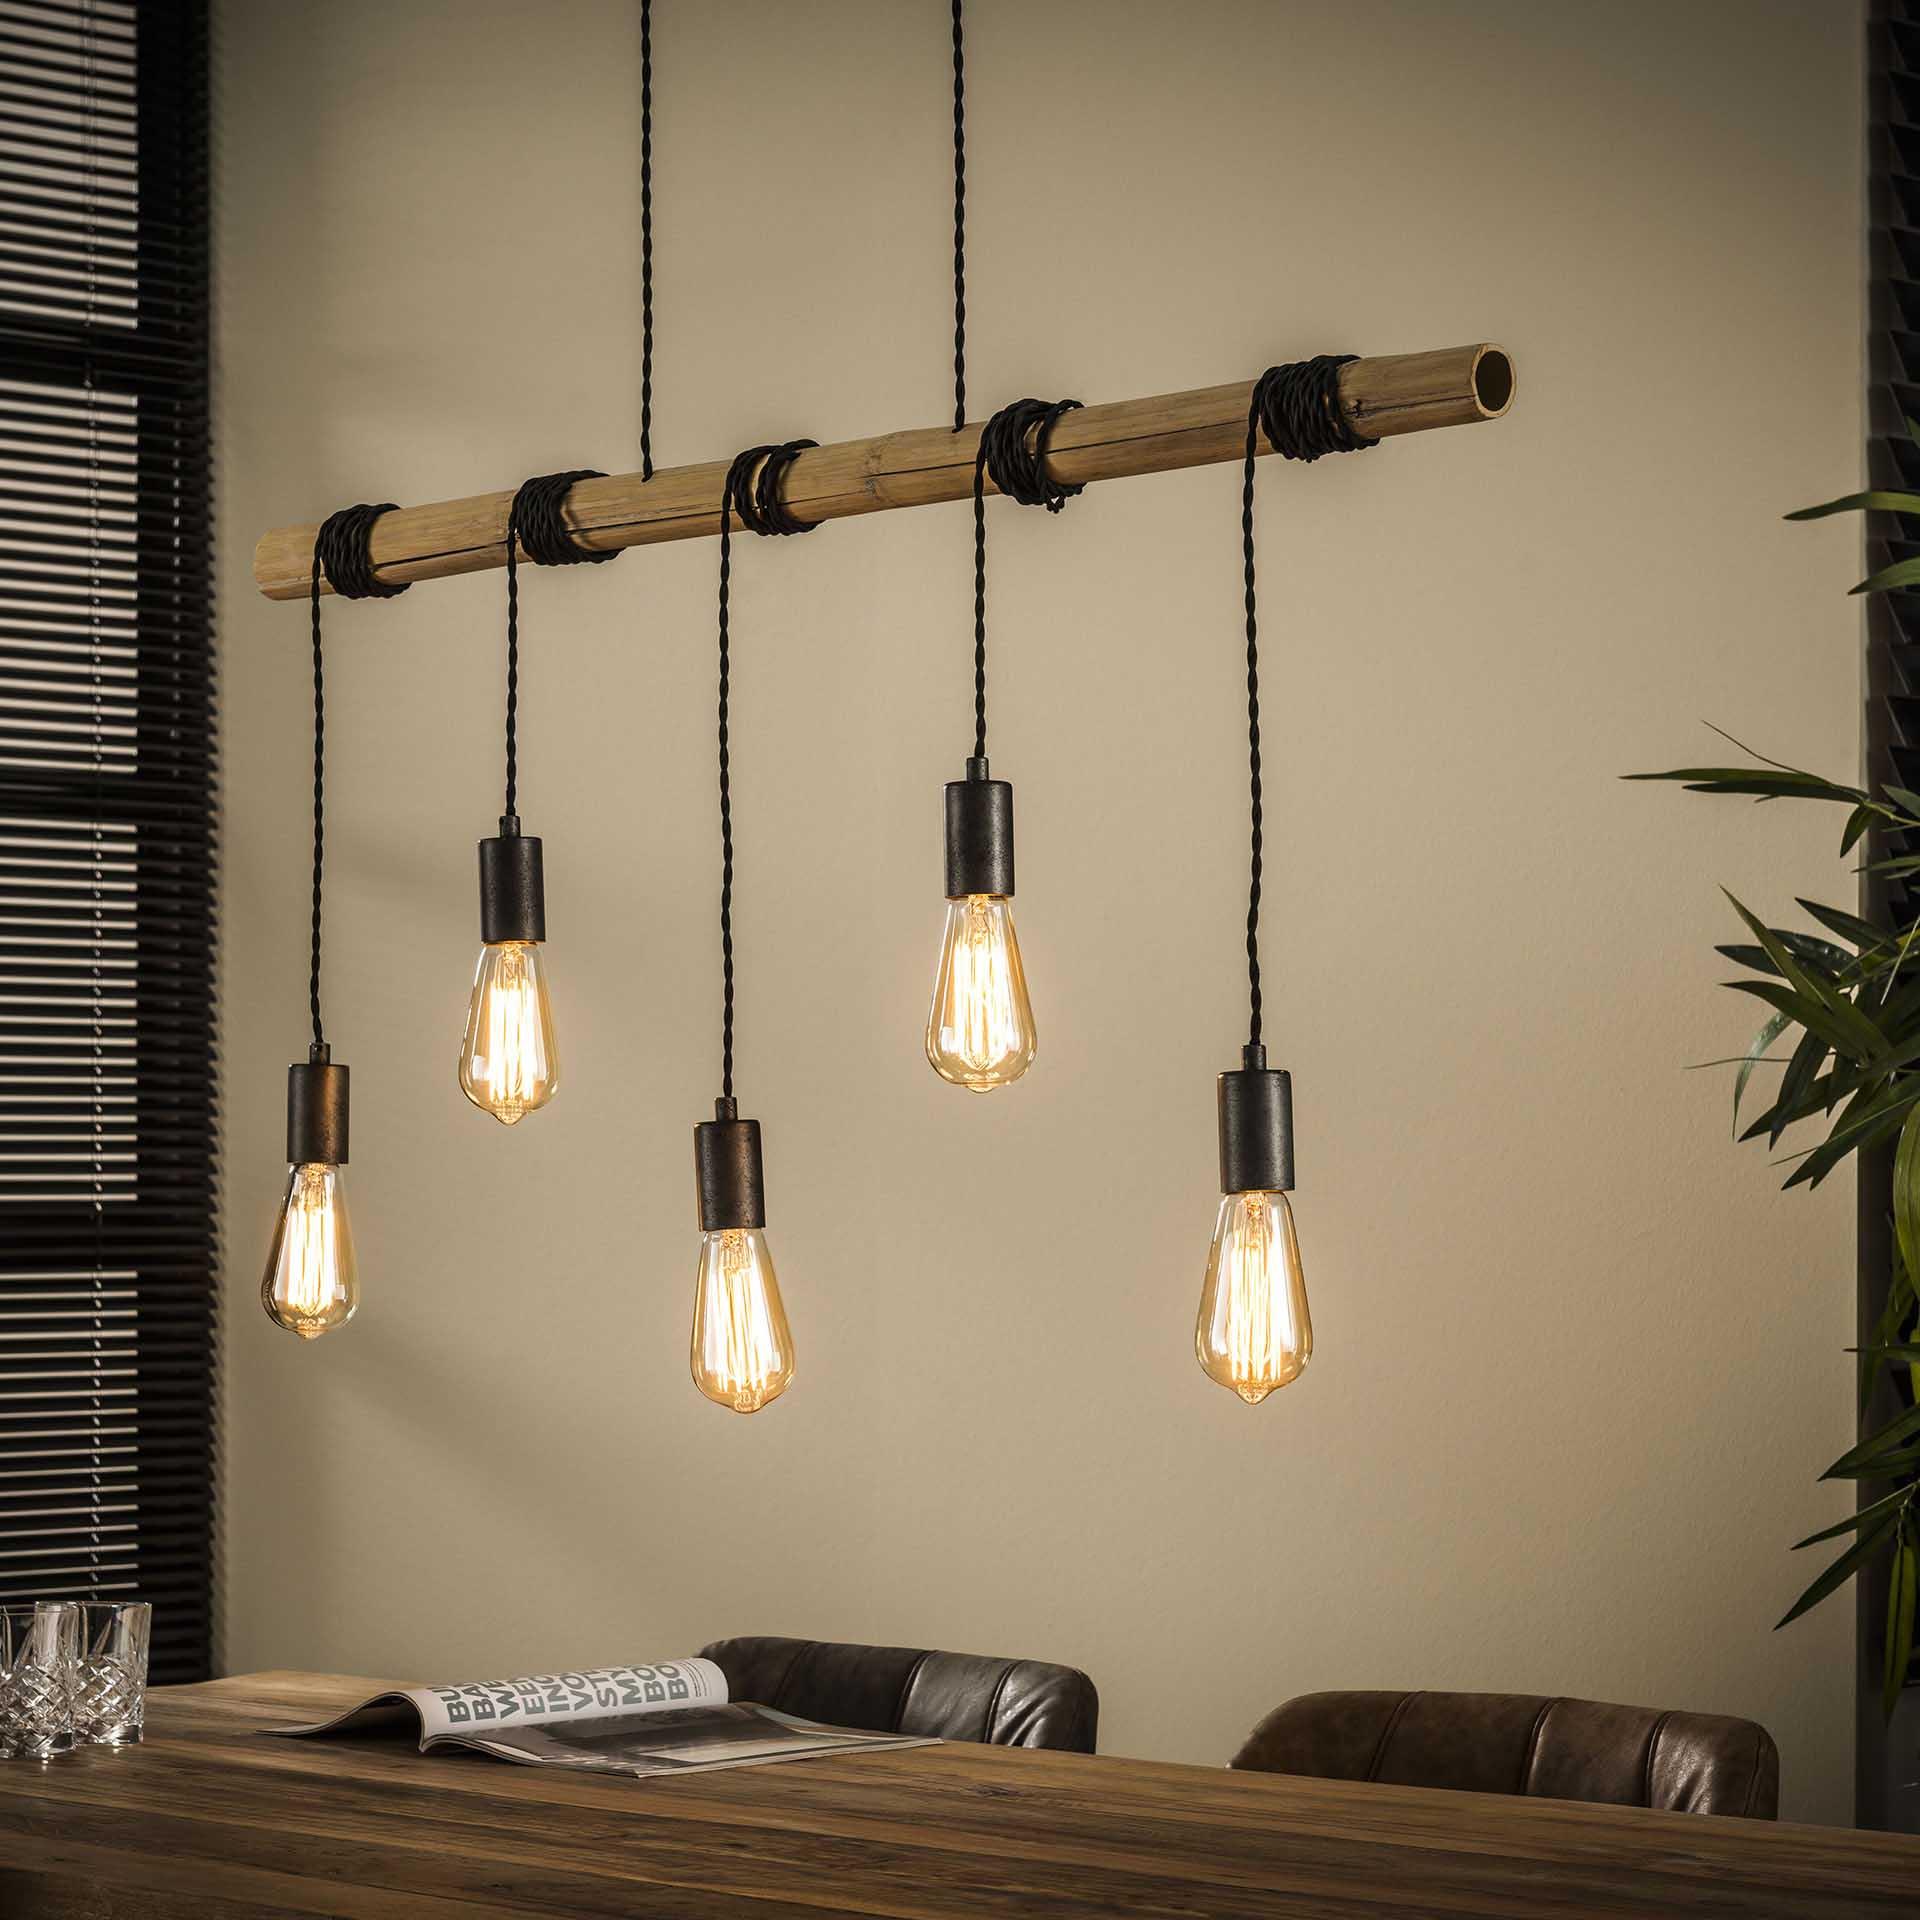 Suspension Lampes Cm 5 Bambou 98 13FJuTlcK